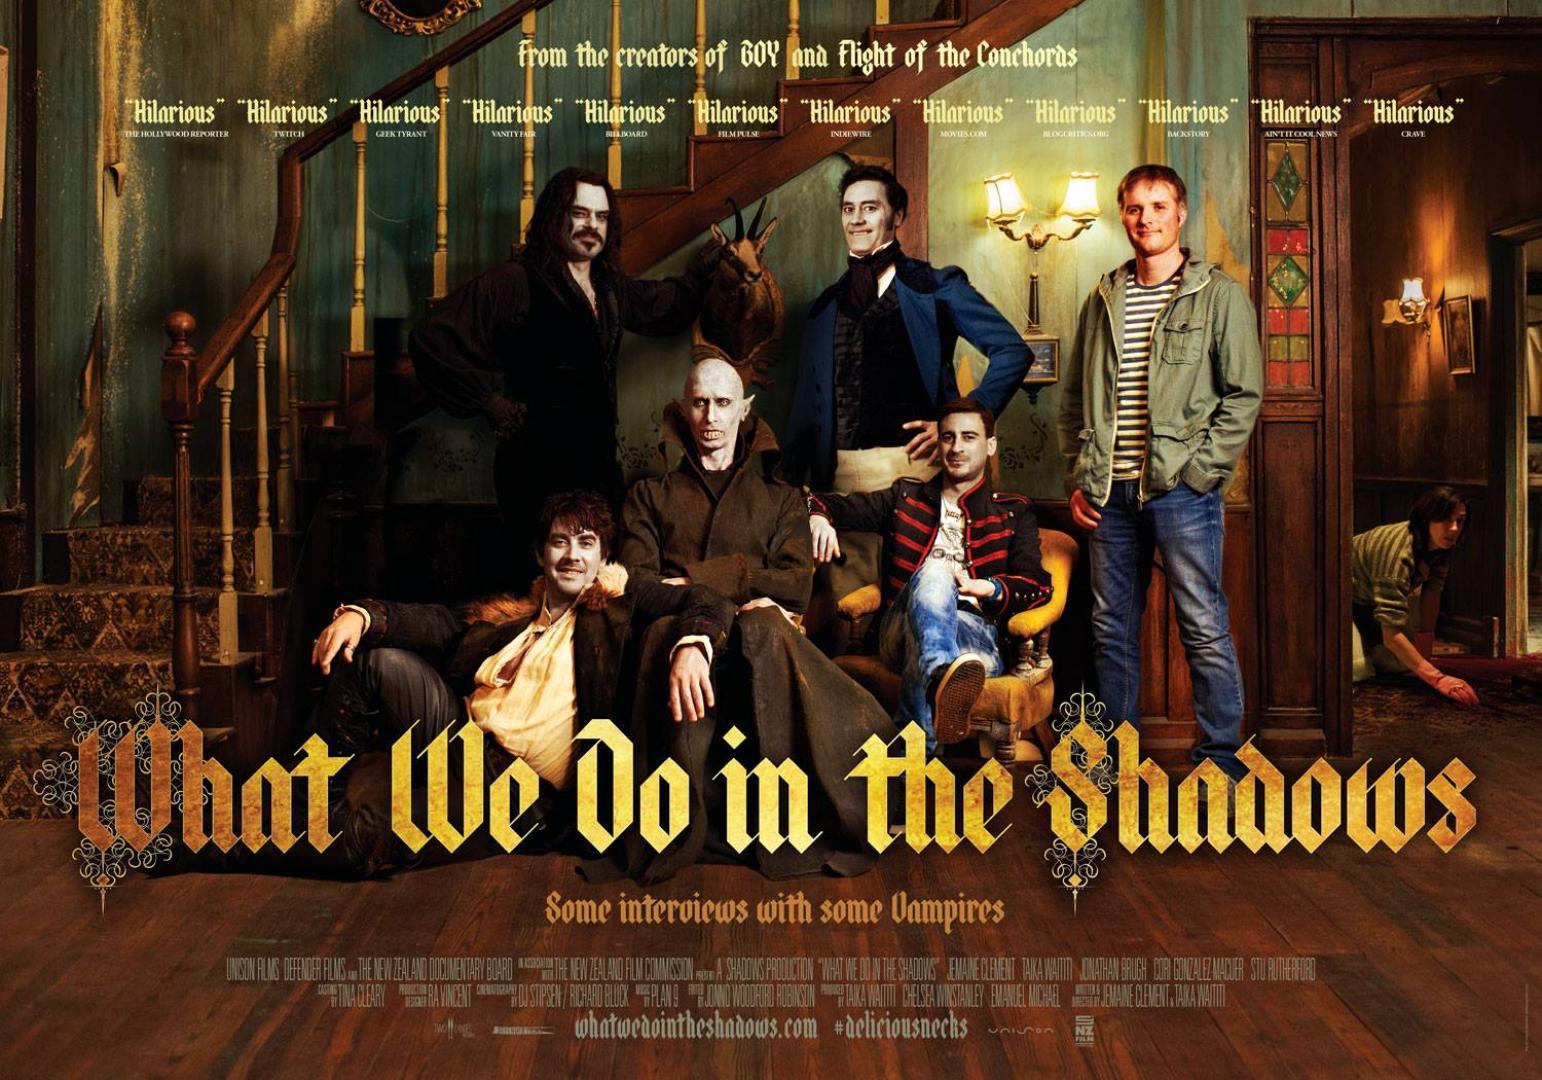 What We Do in the Shadows - Hétköznapi vámpírok (2014)